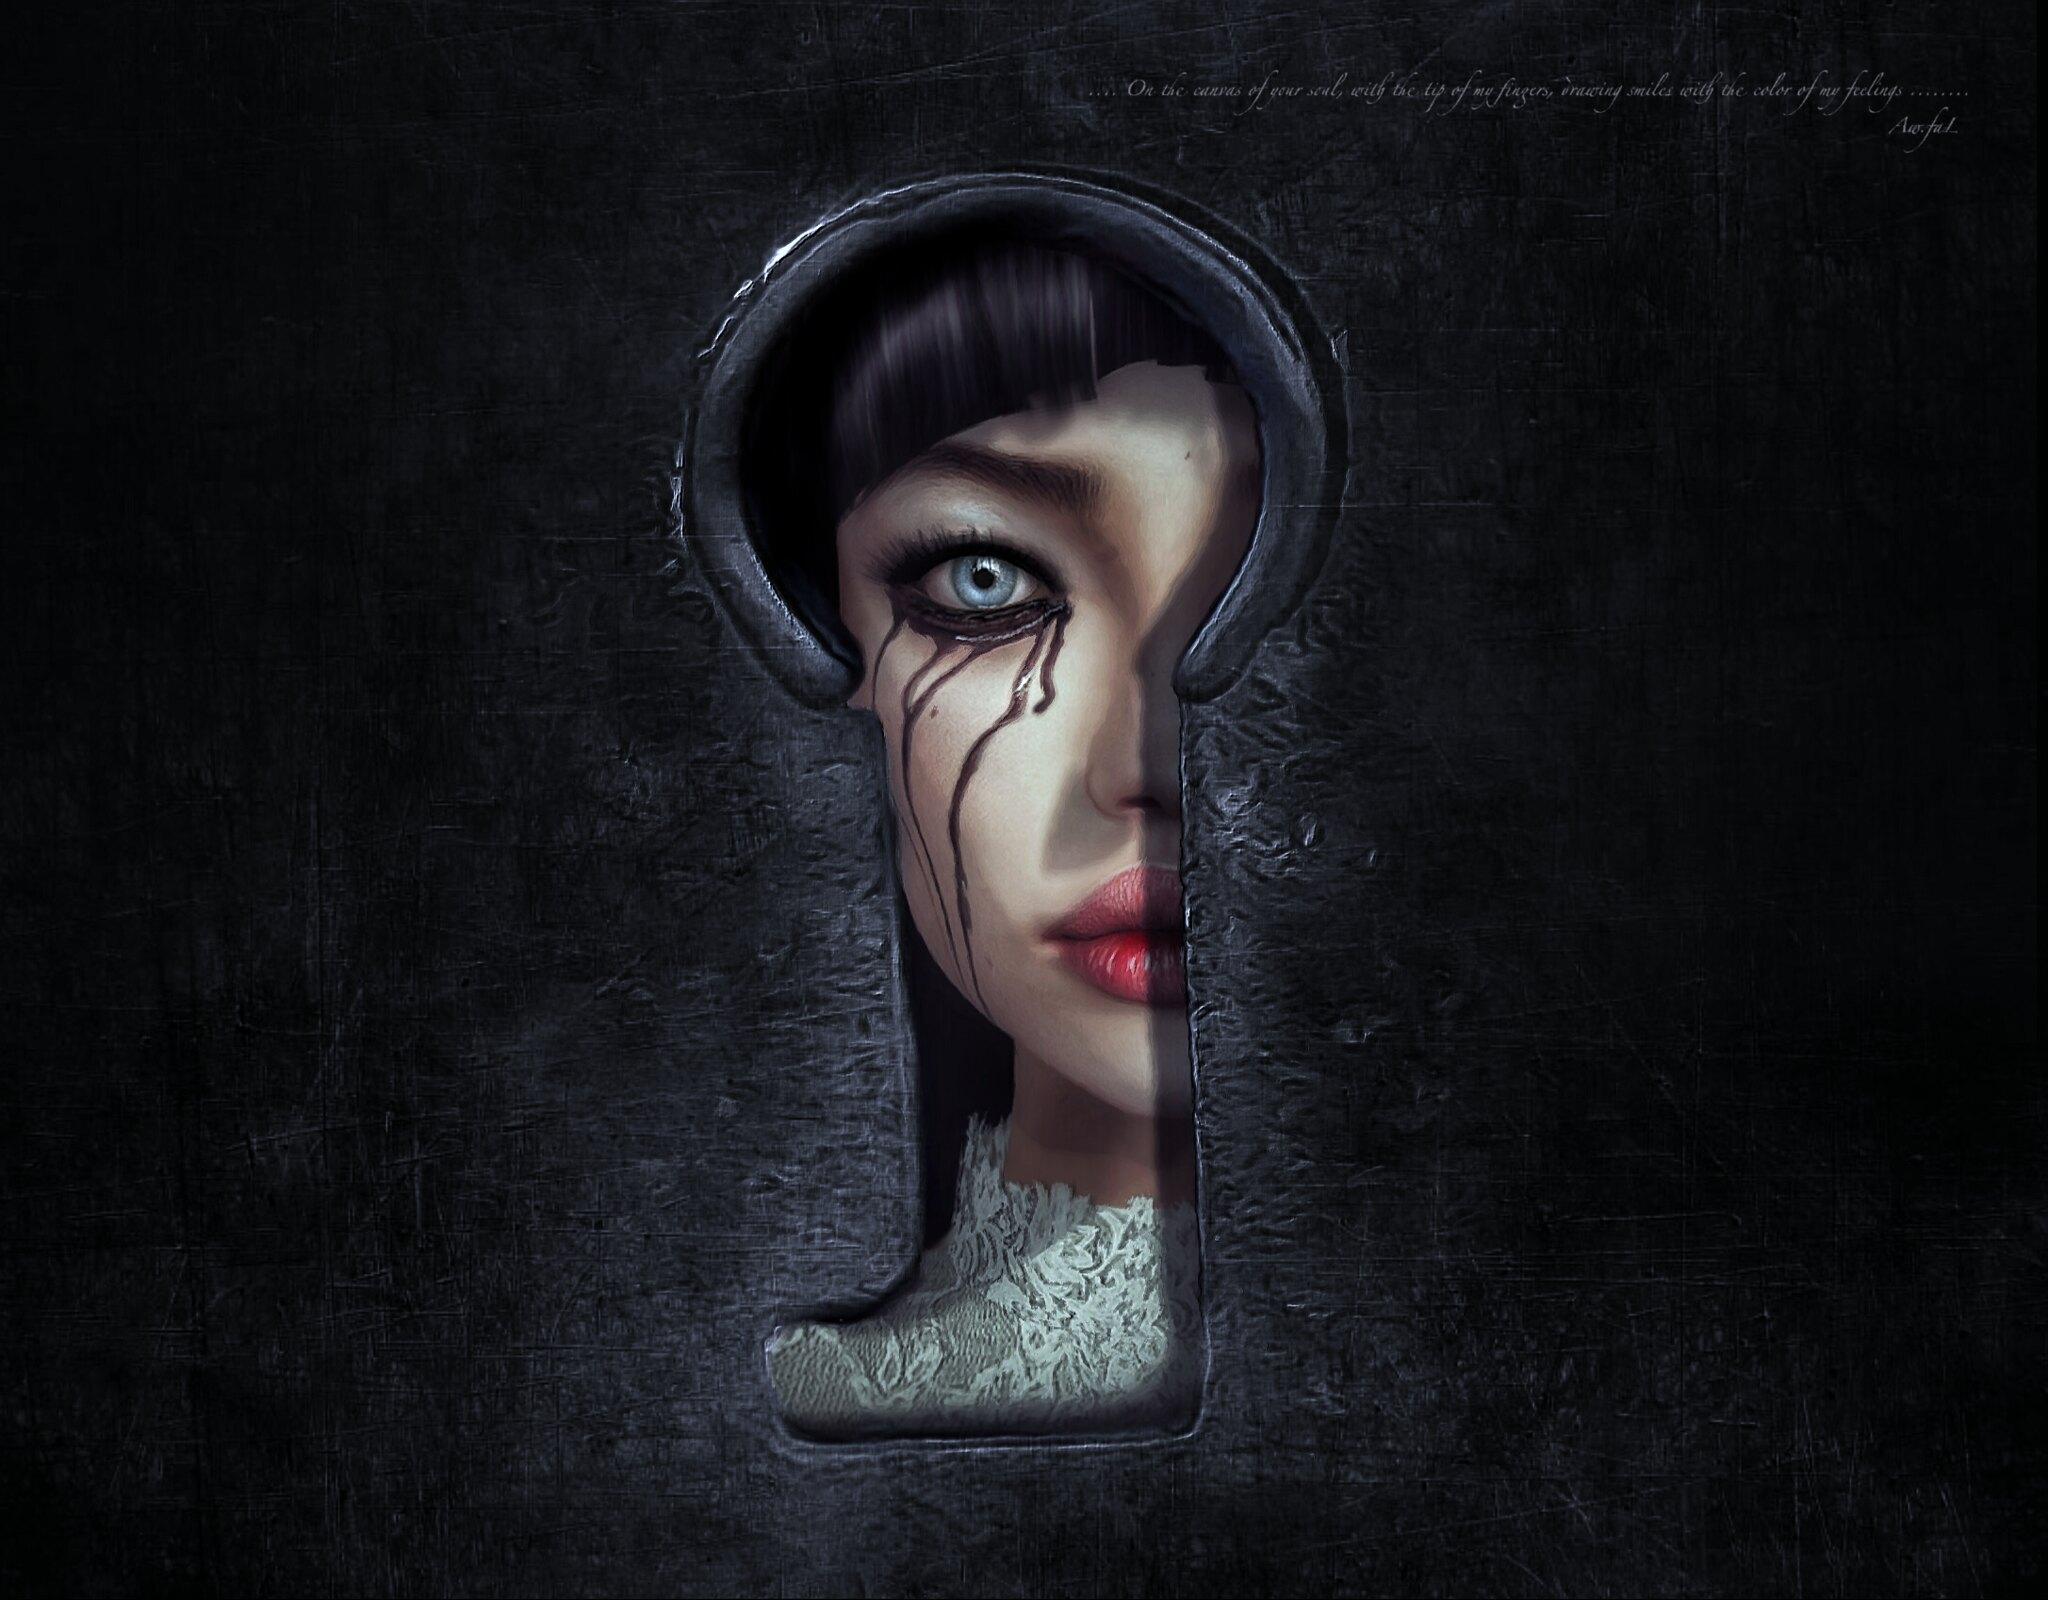 ......... inside myself